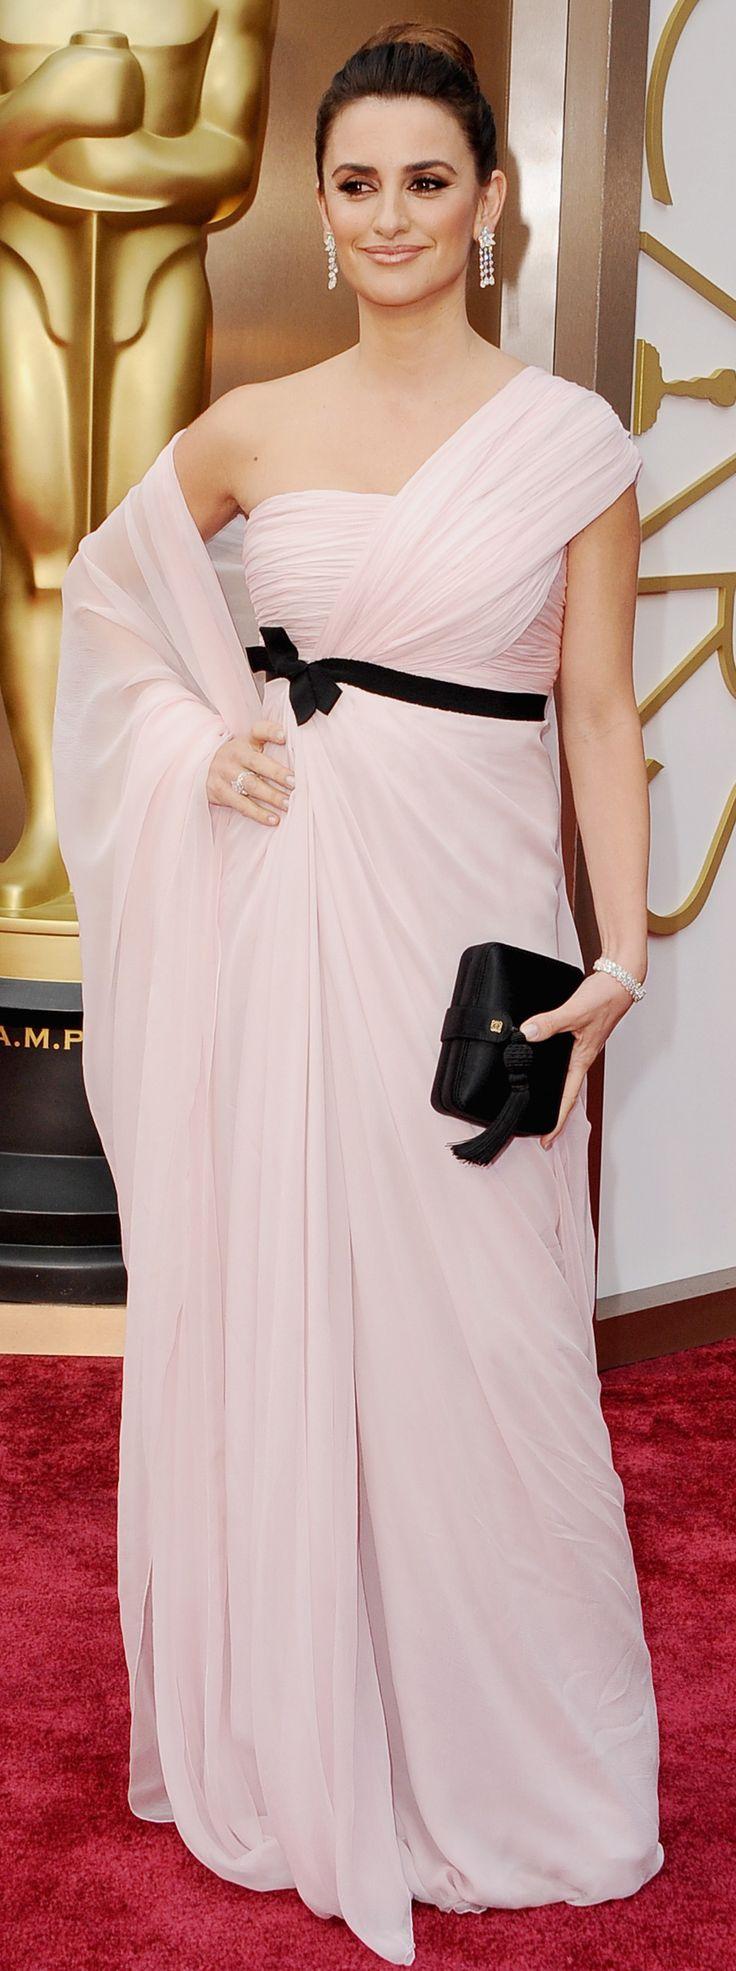 Penélope Cruz's in a blush-pink dress at the Academy Awards. #redcarpet #oscars